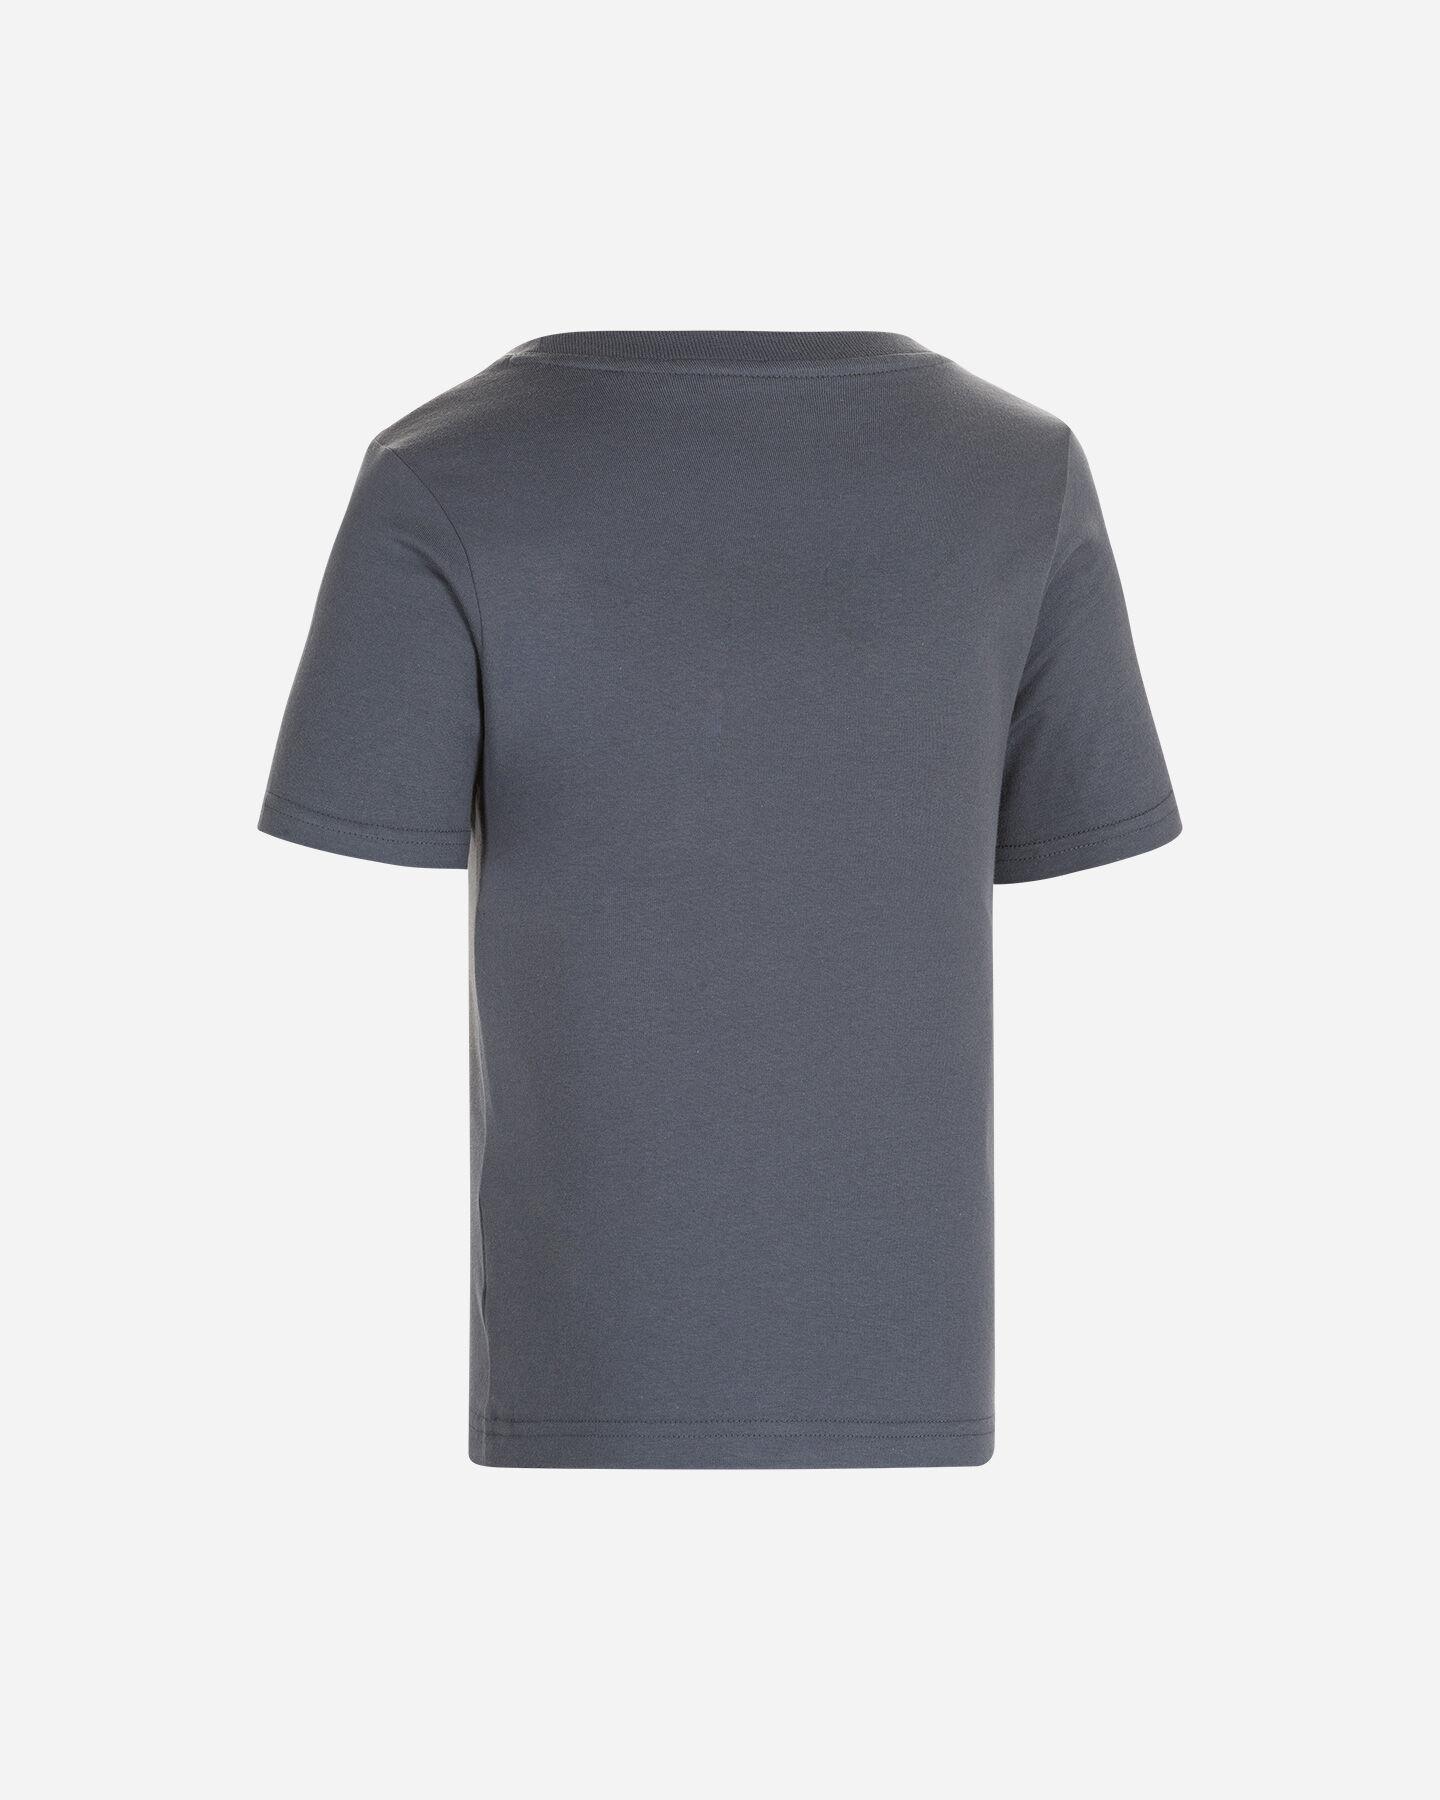 T-Shirt TIMBERLAND PLOGO TREE JR S4088883 scatto 1